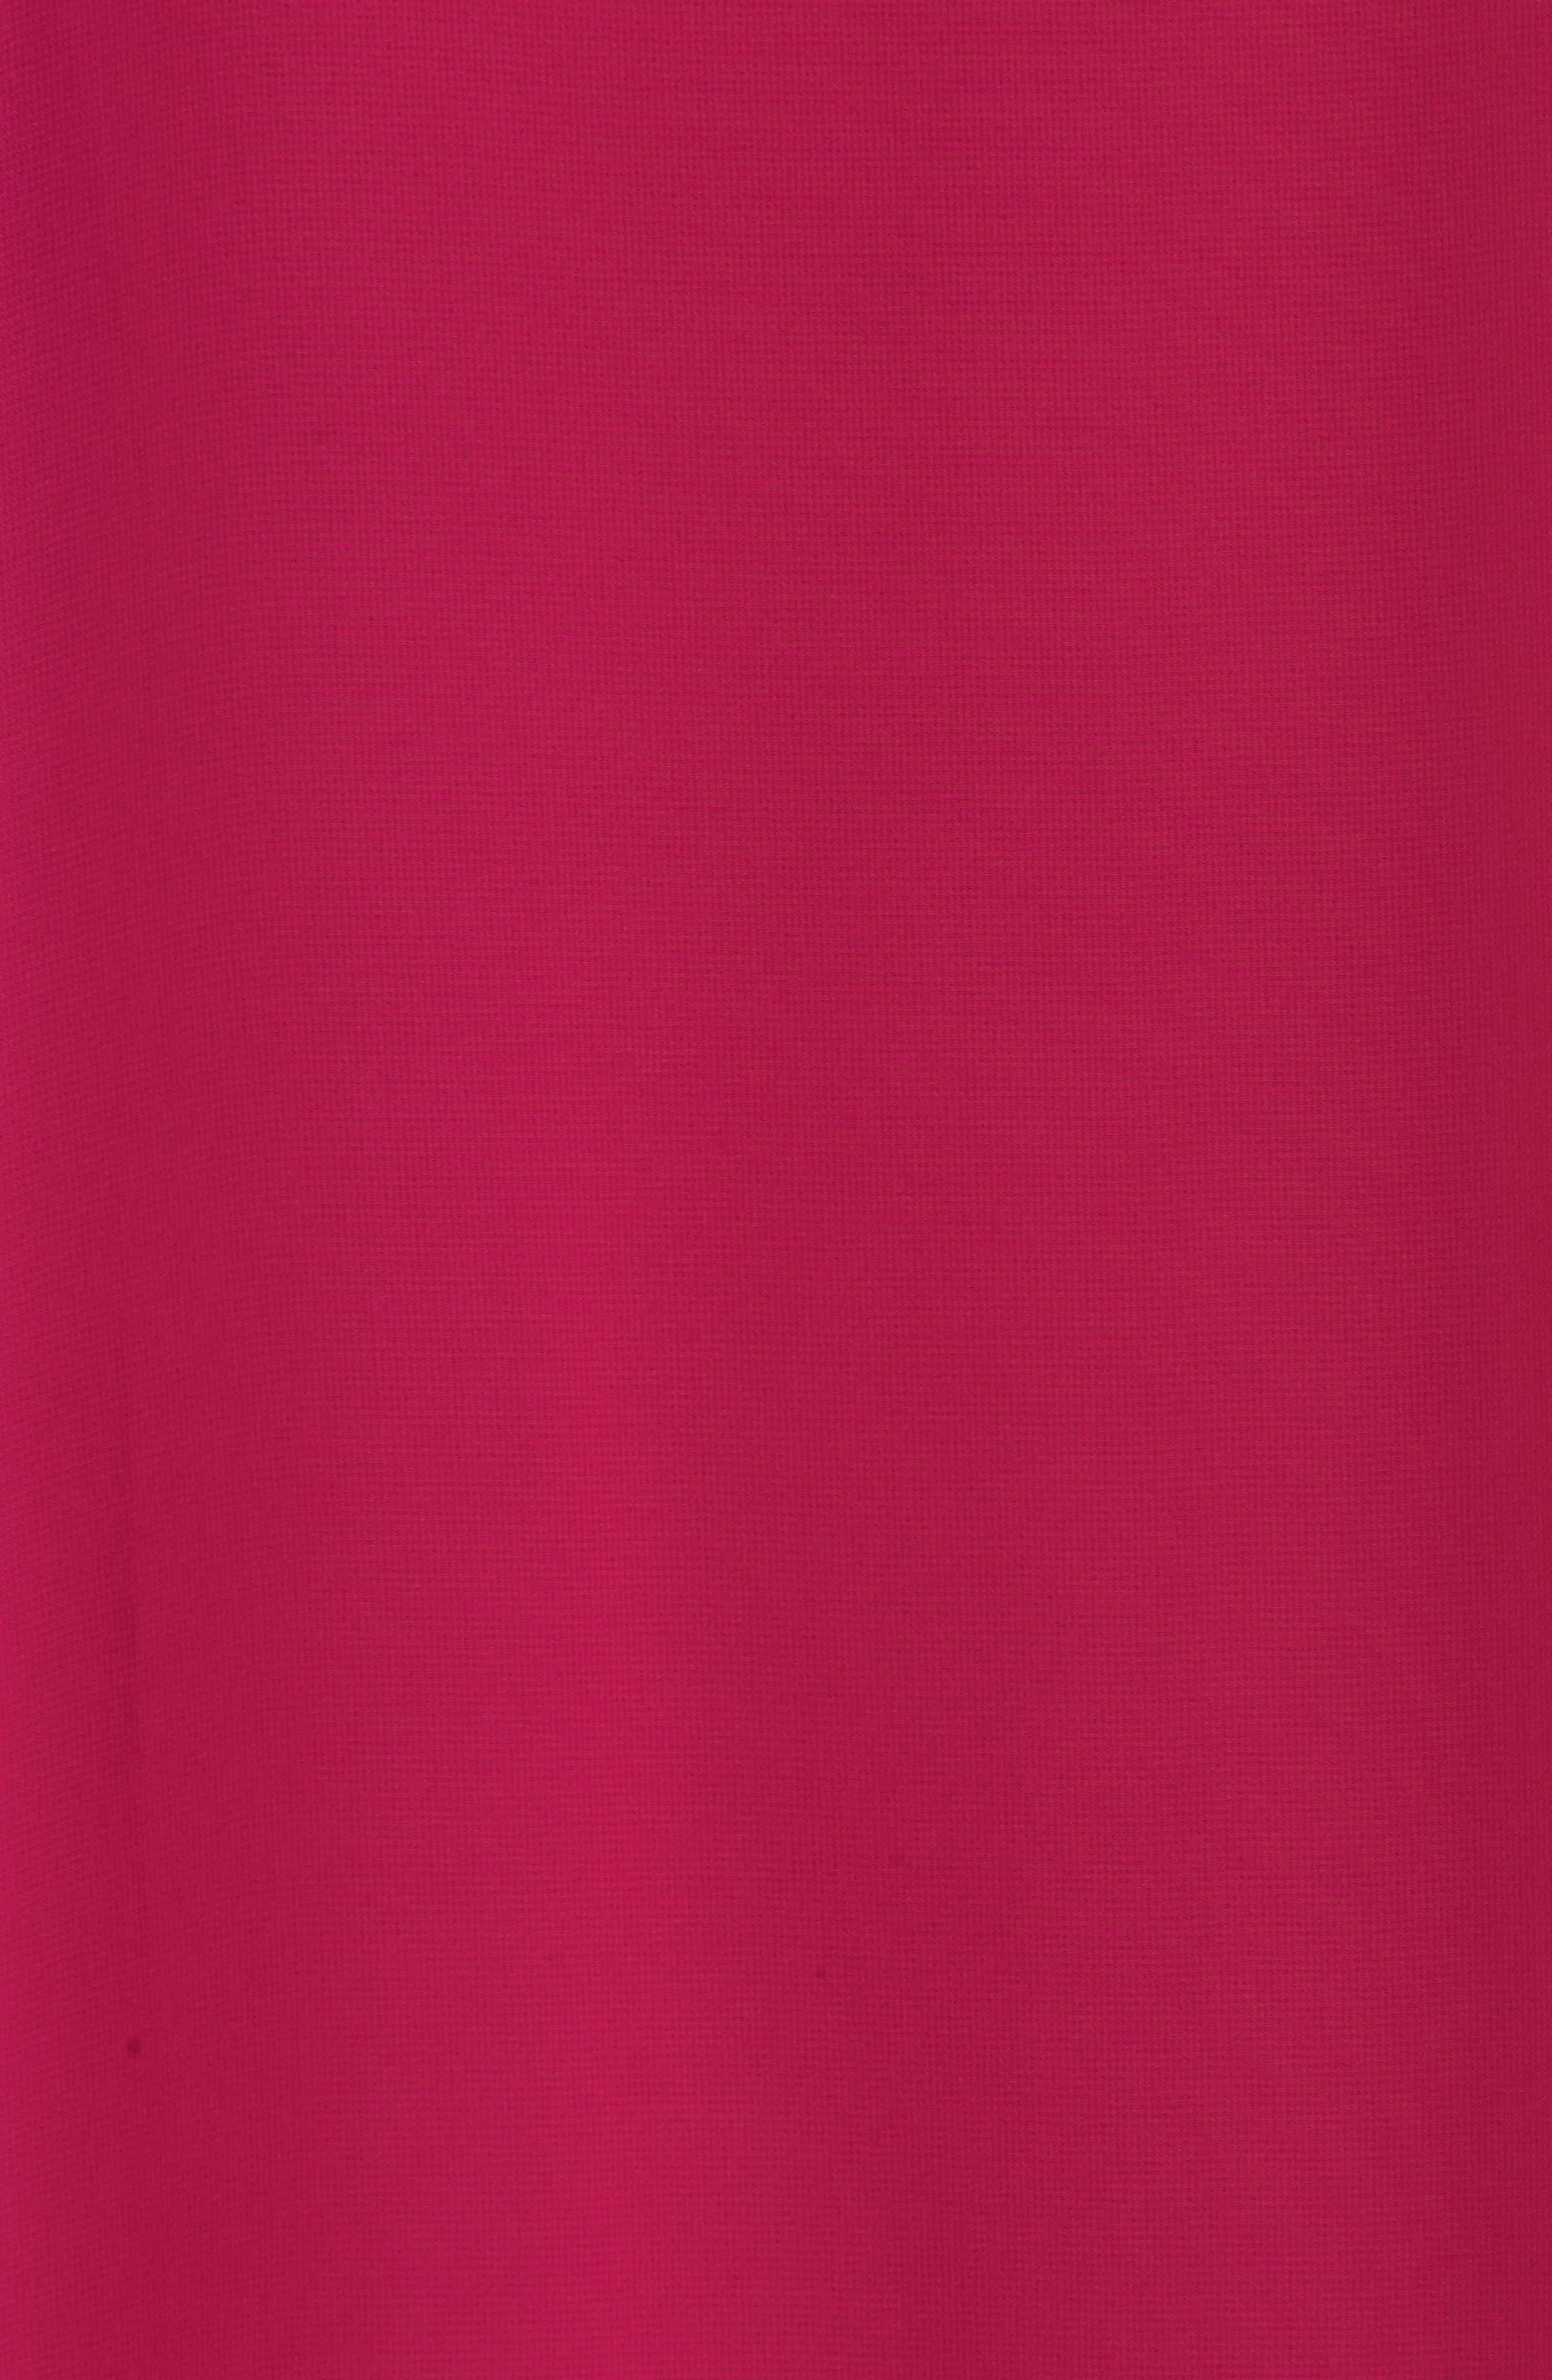 Chiffon Cape Sheath Dress,                             Alternate thumbnail 5, color,                             Magenta